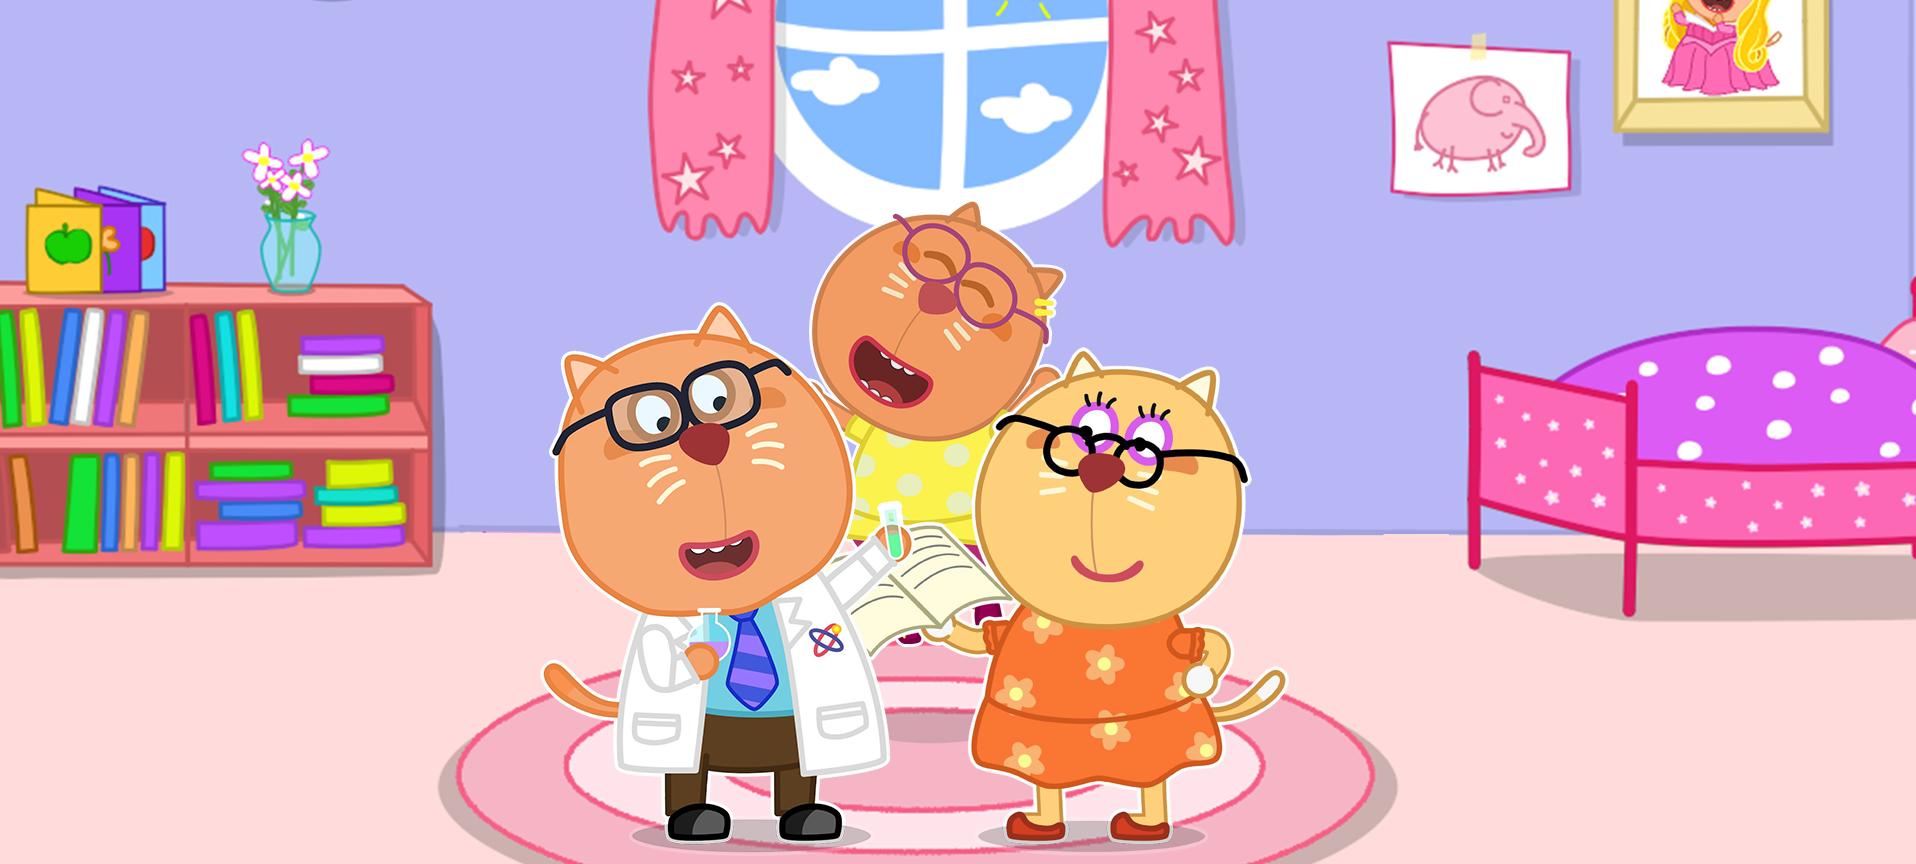 KAT FAMILY: A WISDOM family